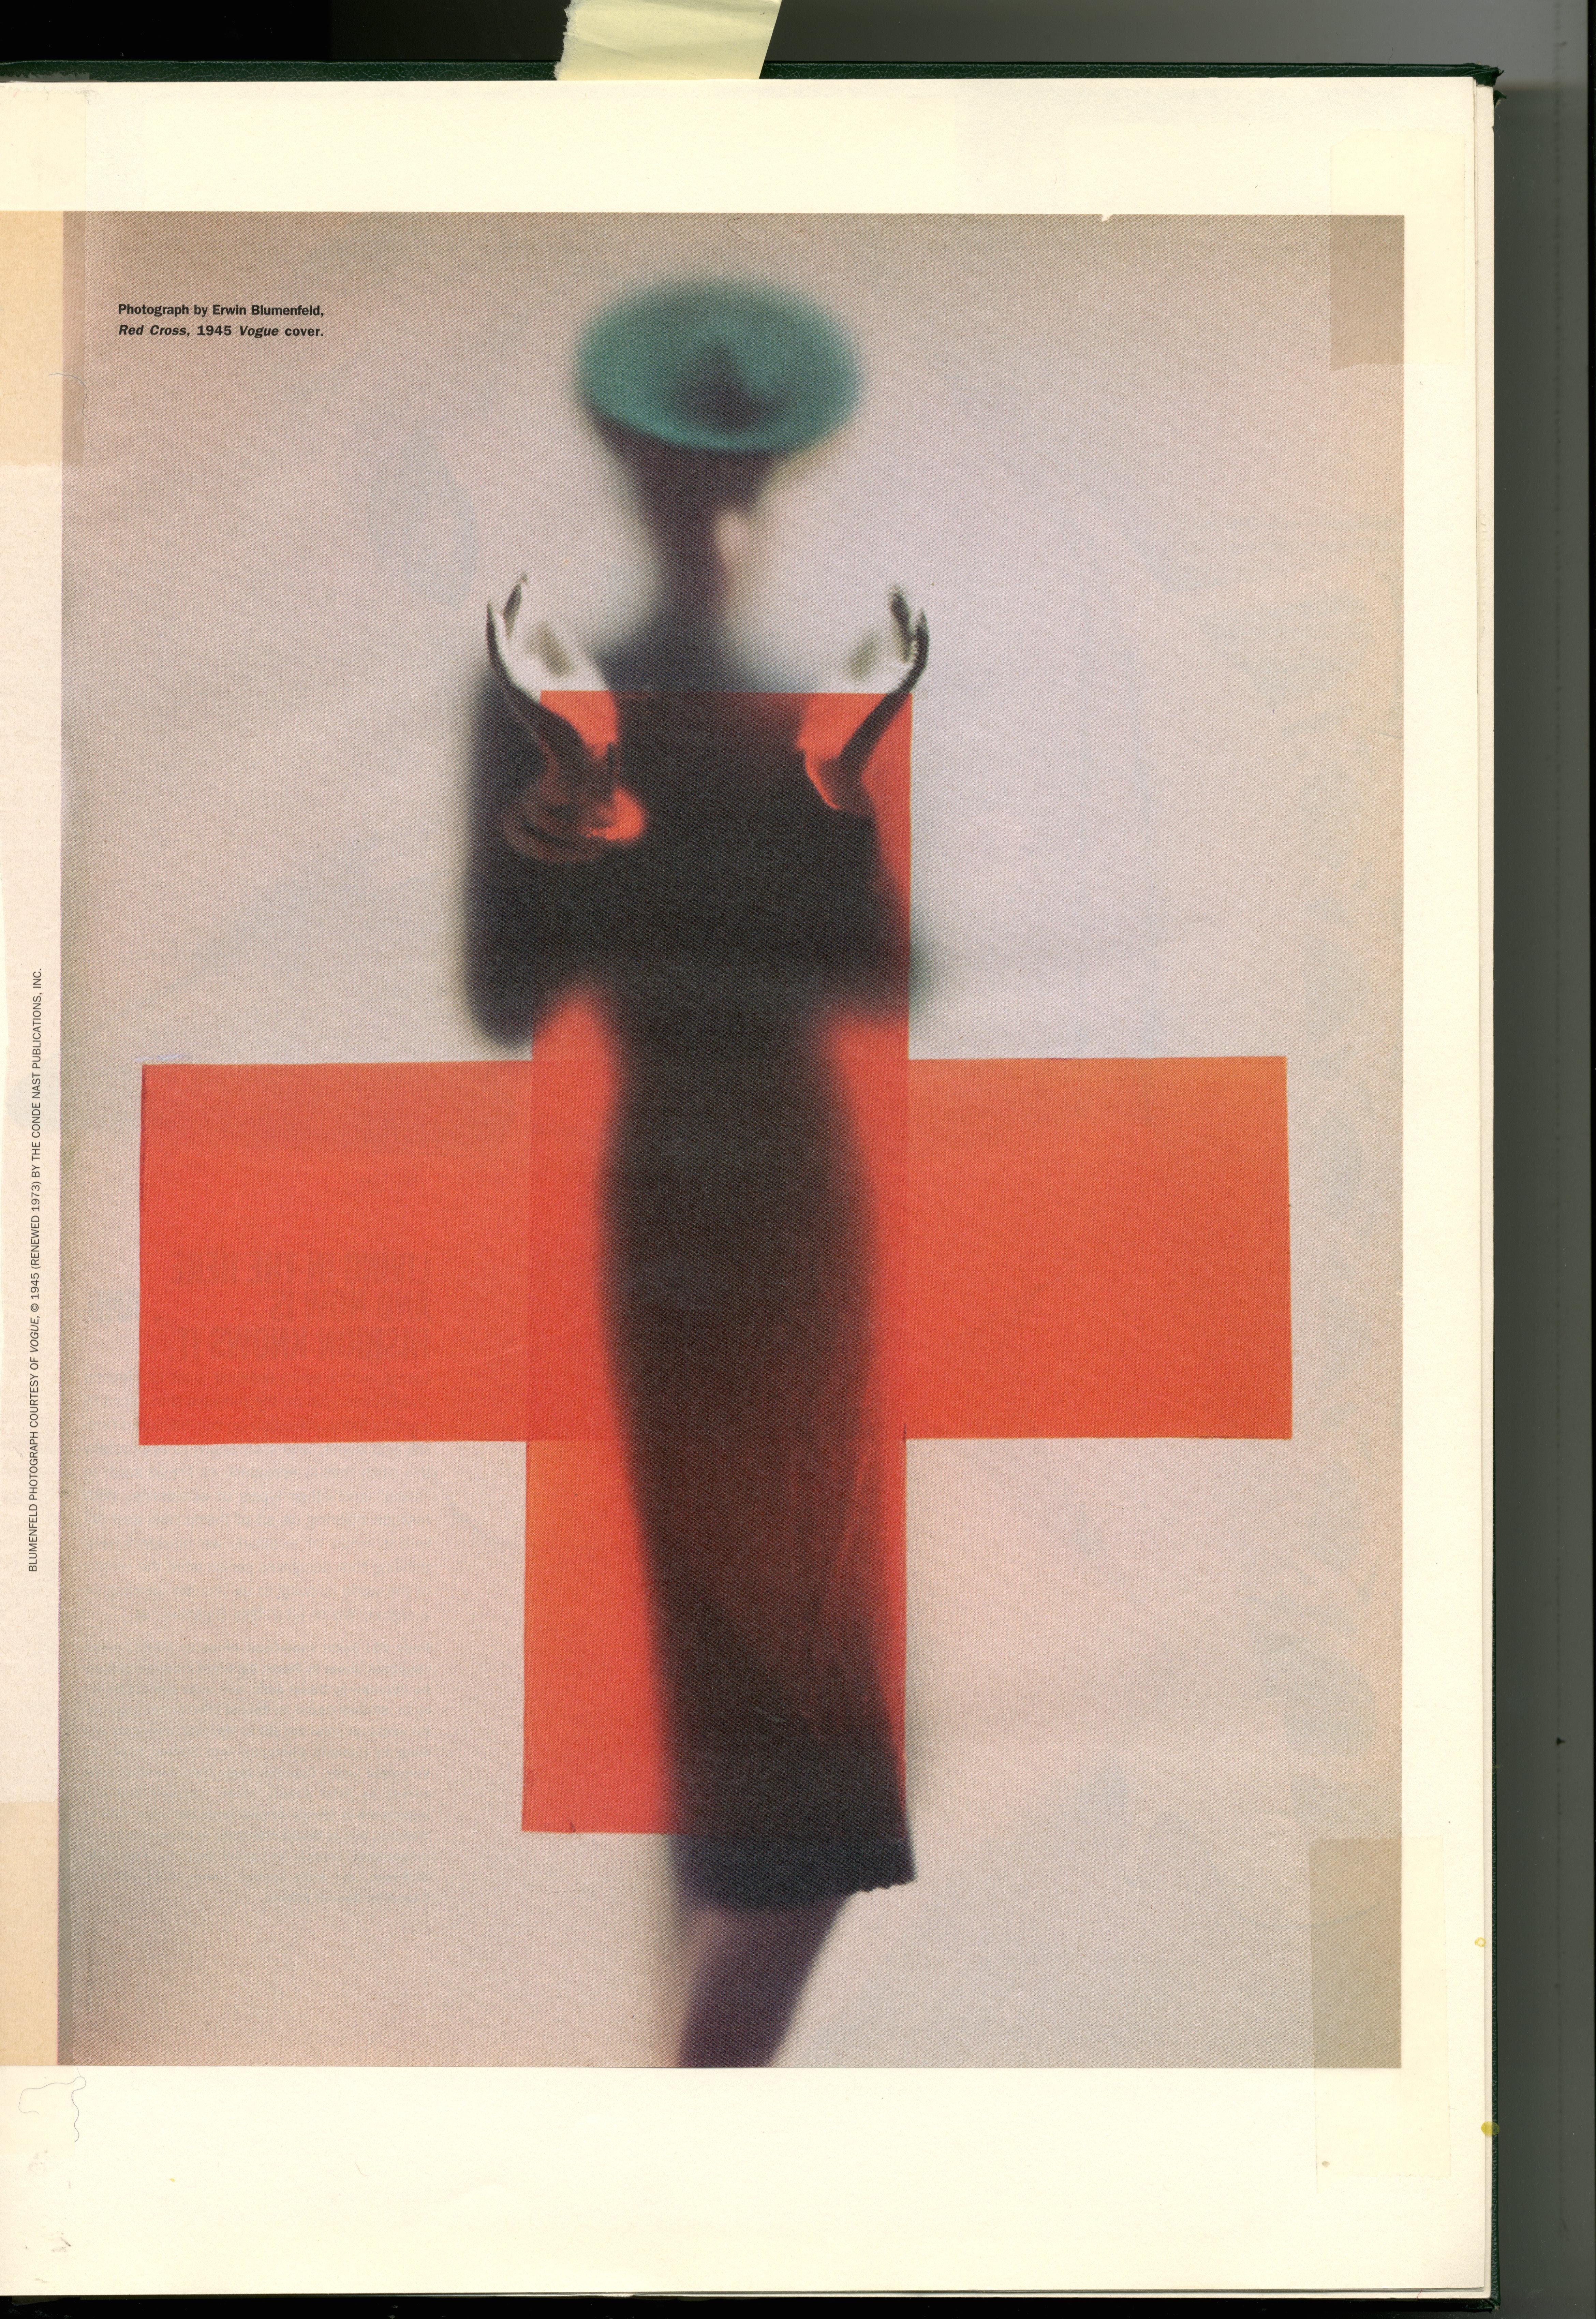 Erwin Blumenfeld : Red Cross : Dave Dye